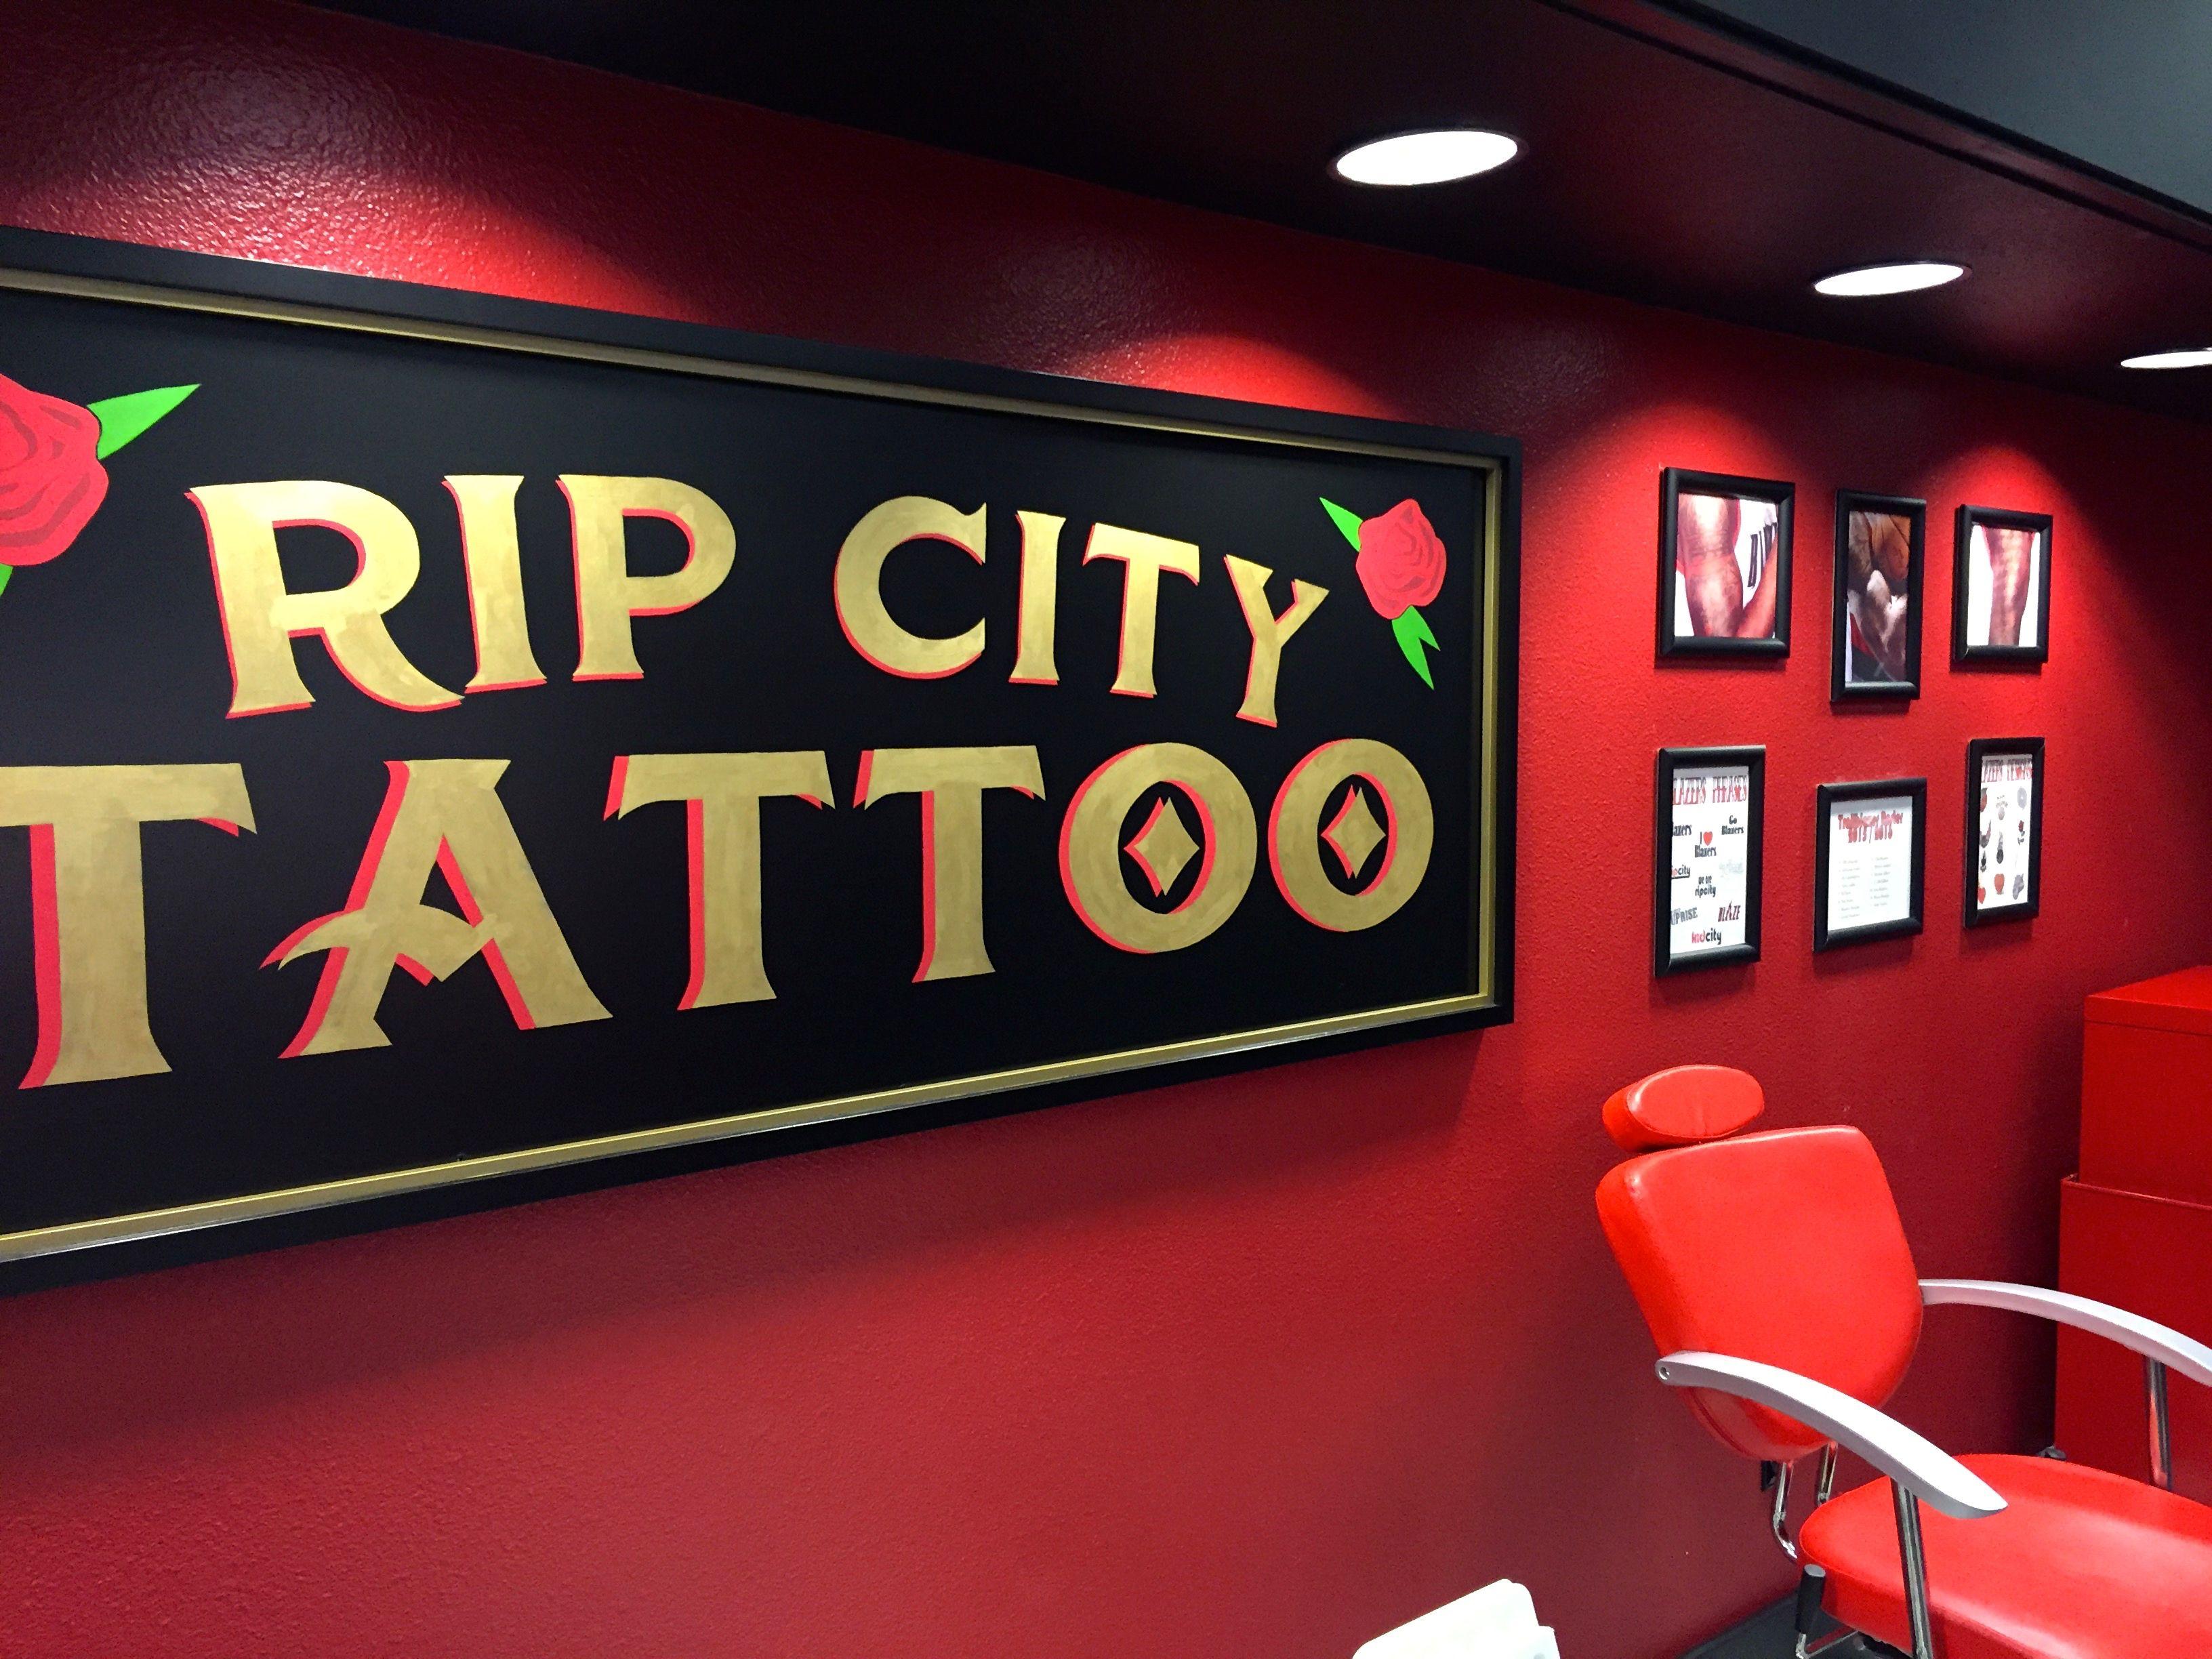 Rip City Tattoo signage · City TattooSignagePortland Trailblazers